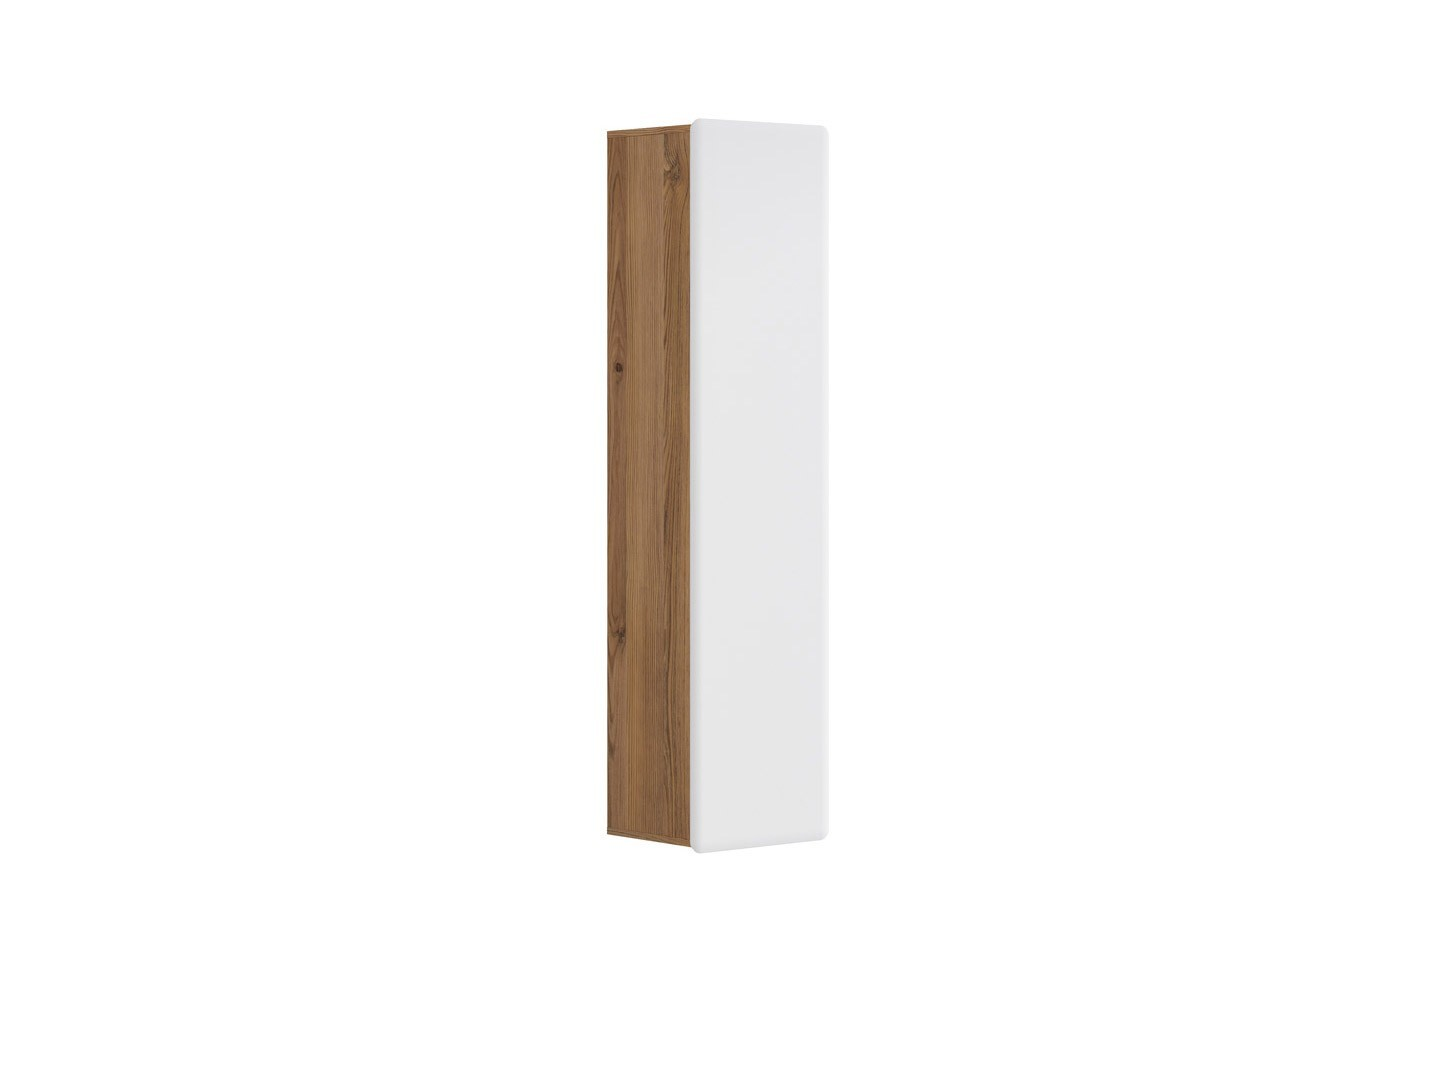 Skříňka na stěnu - BRW - Possi Light - SFW1D/16/4 (modřín sibiu zlatý + lesk bílý)